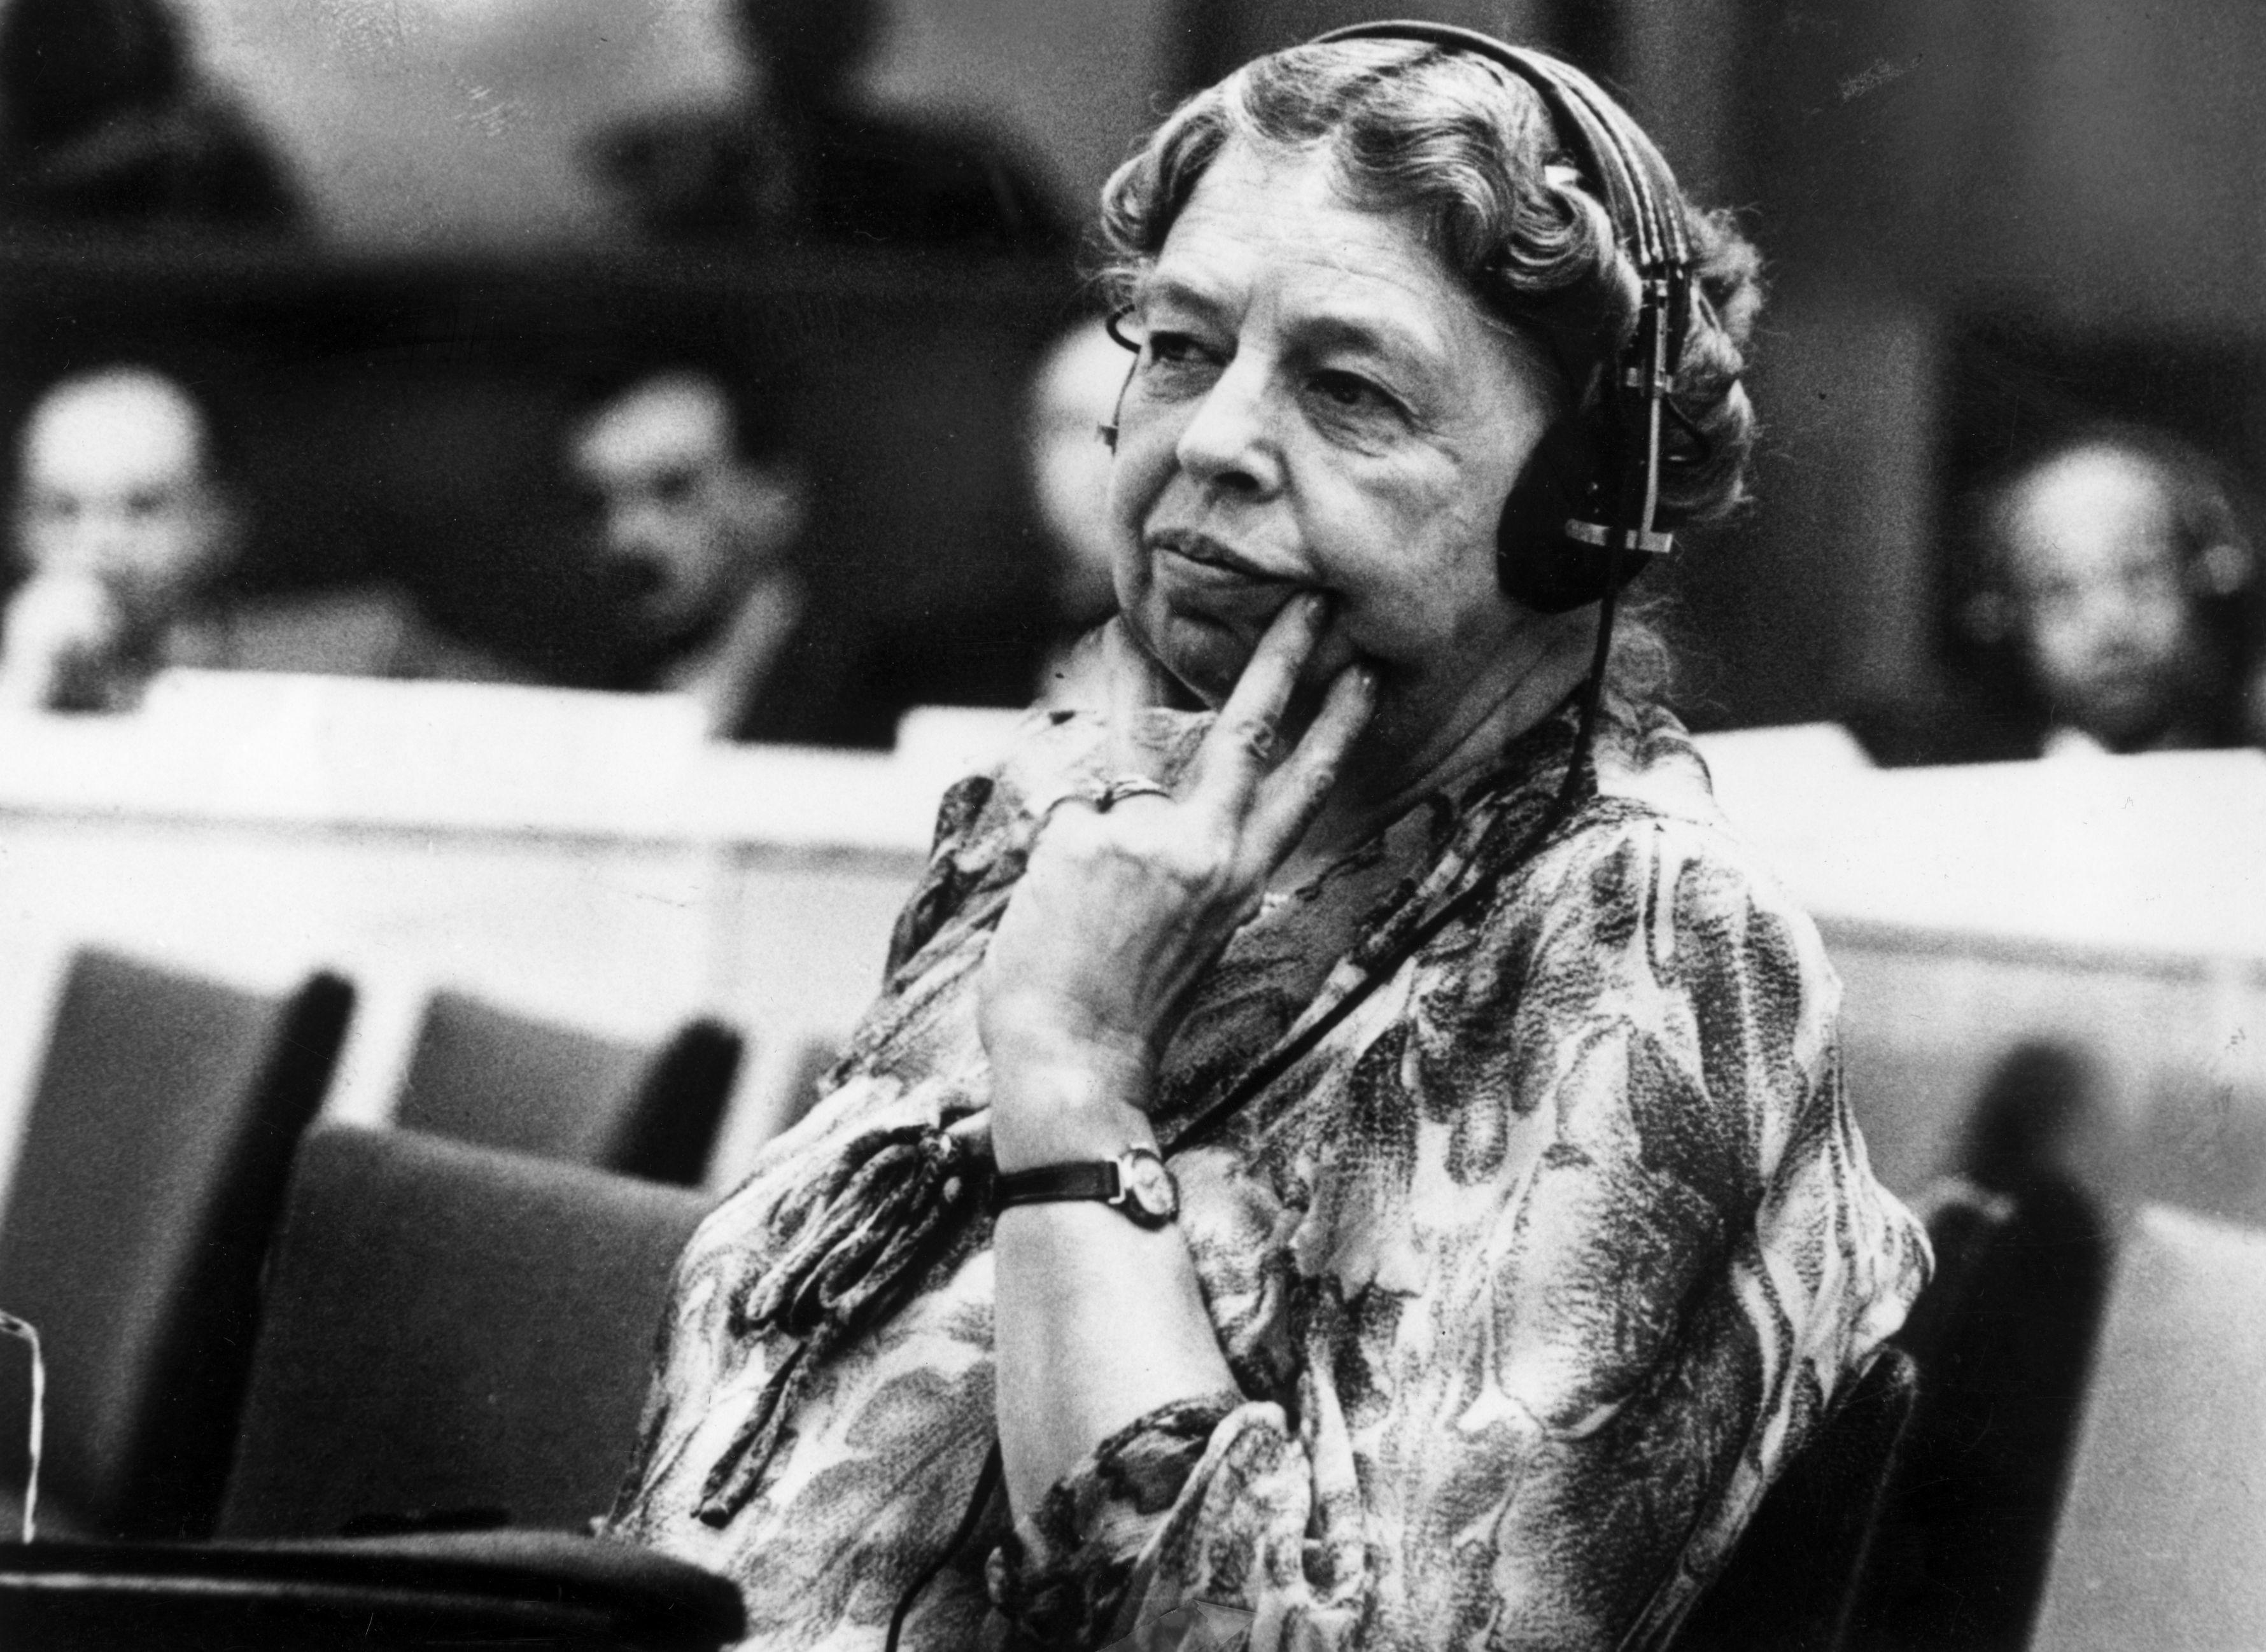 Eleanor Roosevelt listening through headphones at UN conference